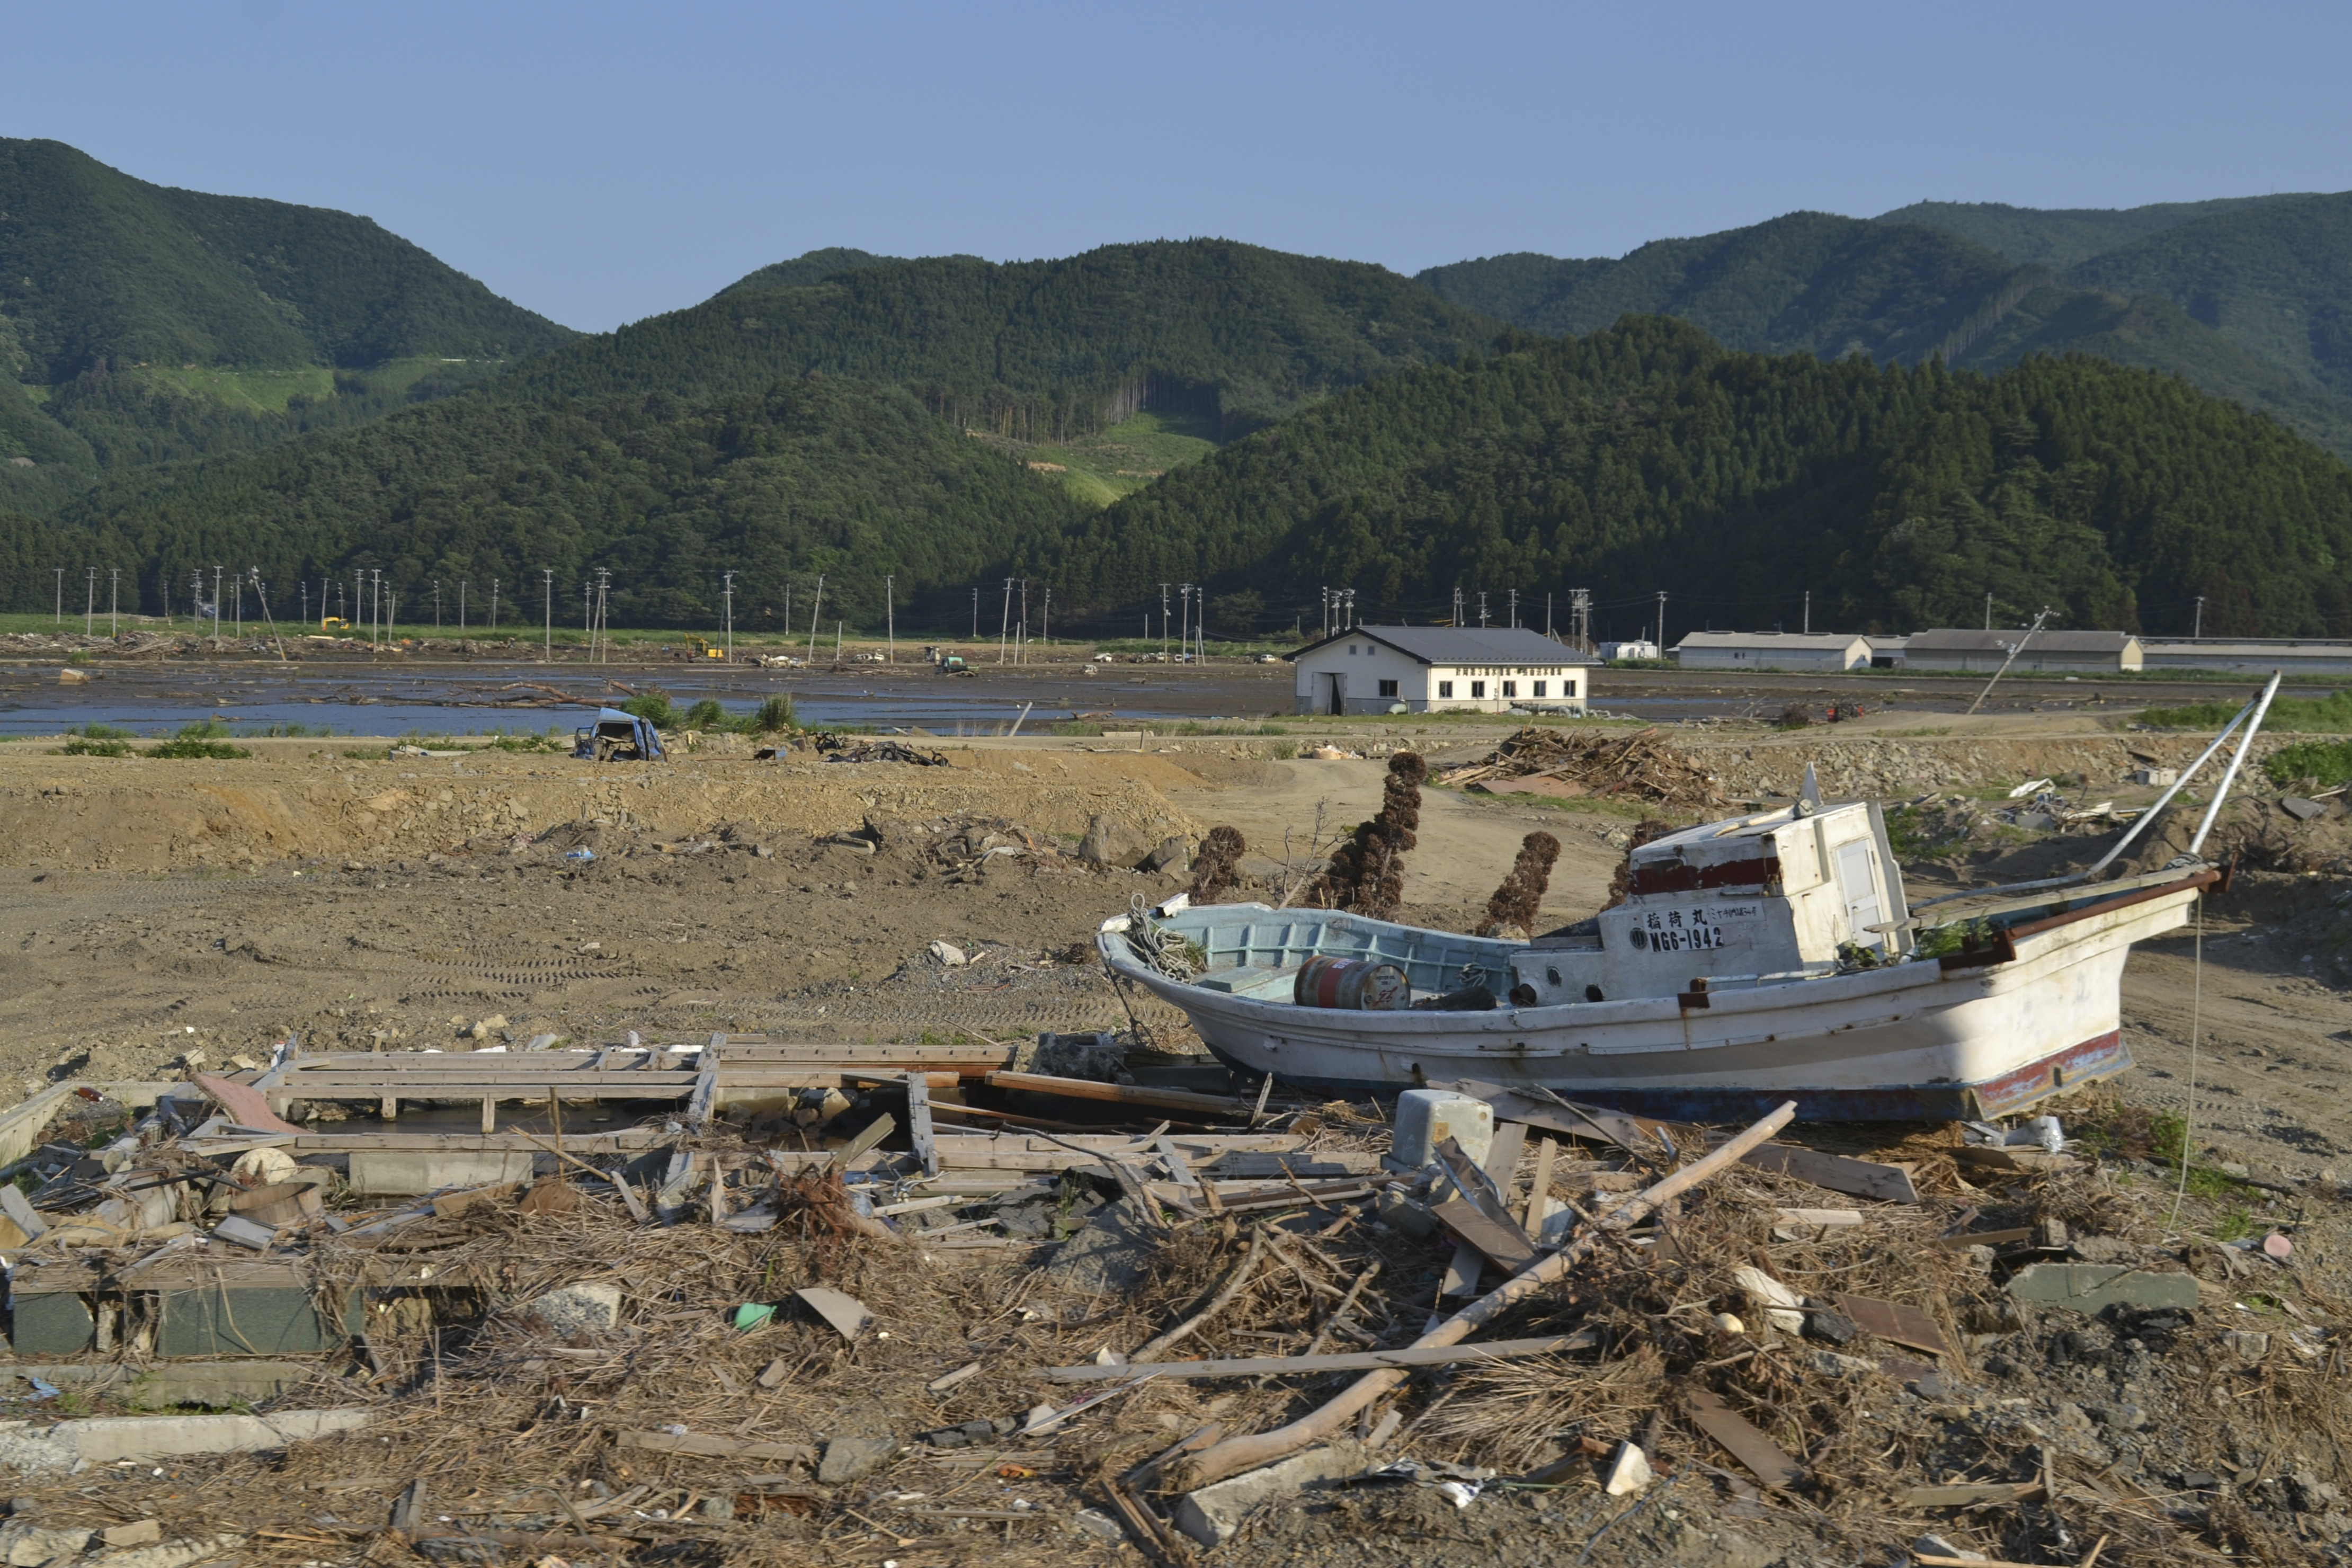 naburi near okawa fishboat in debris.jpg